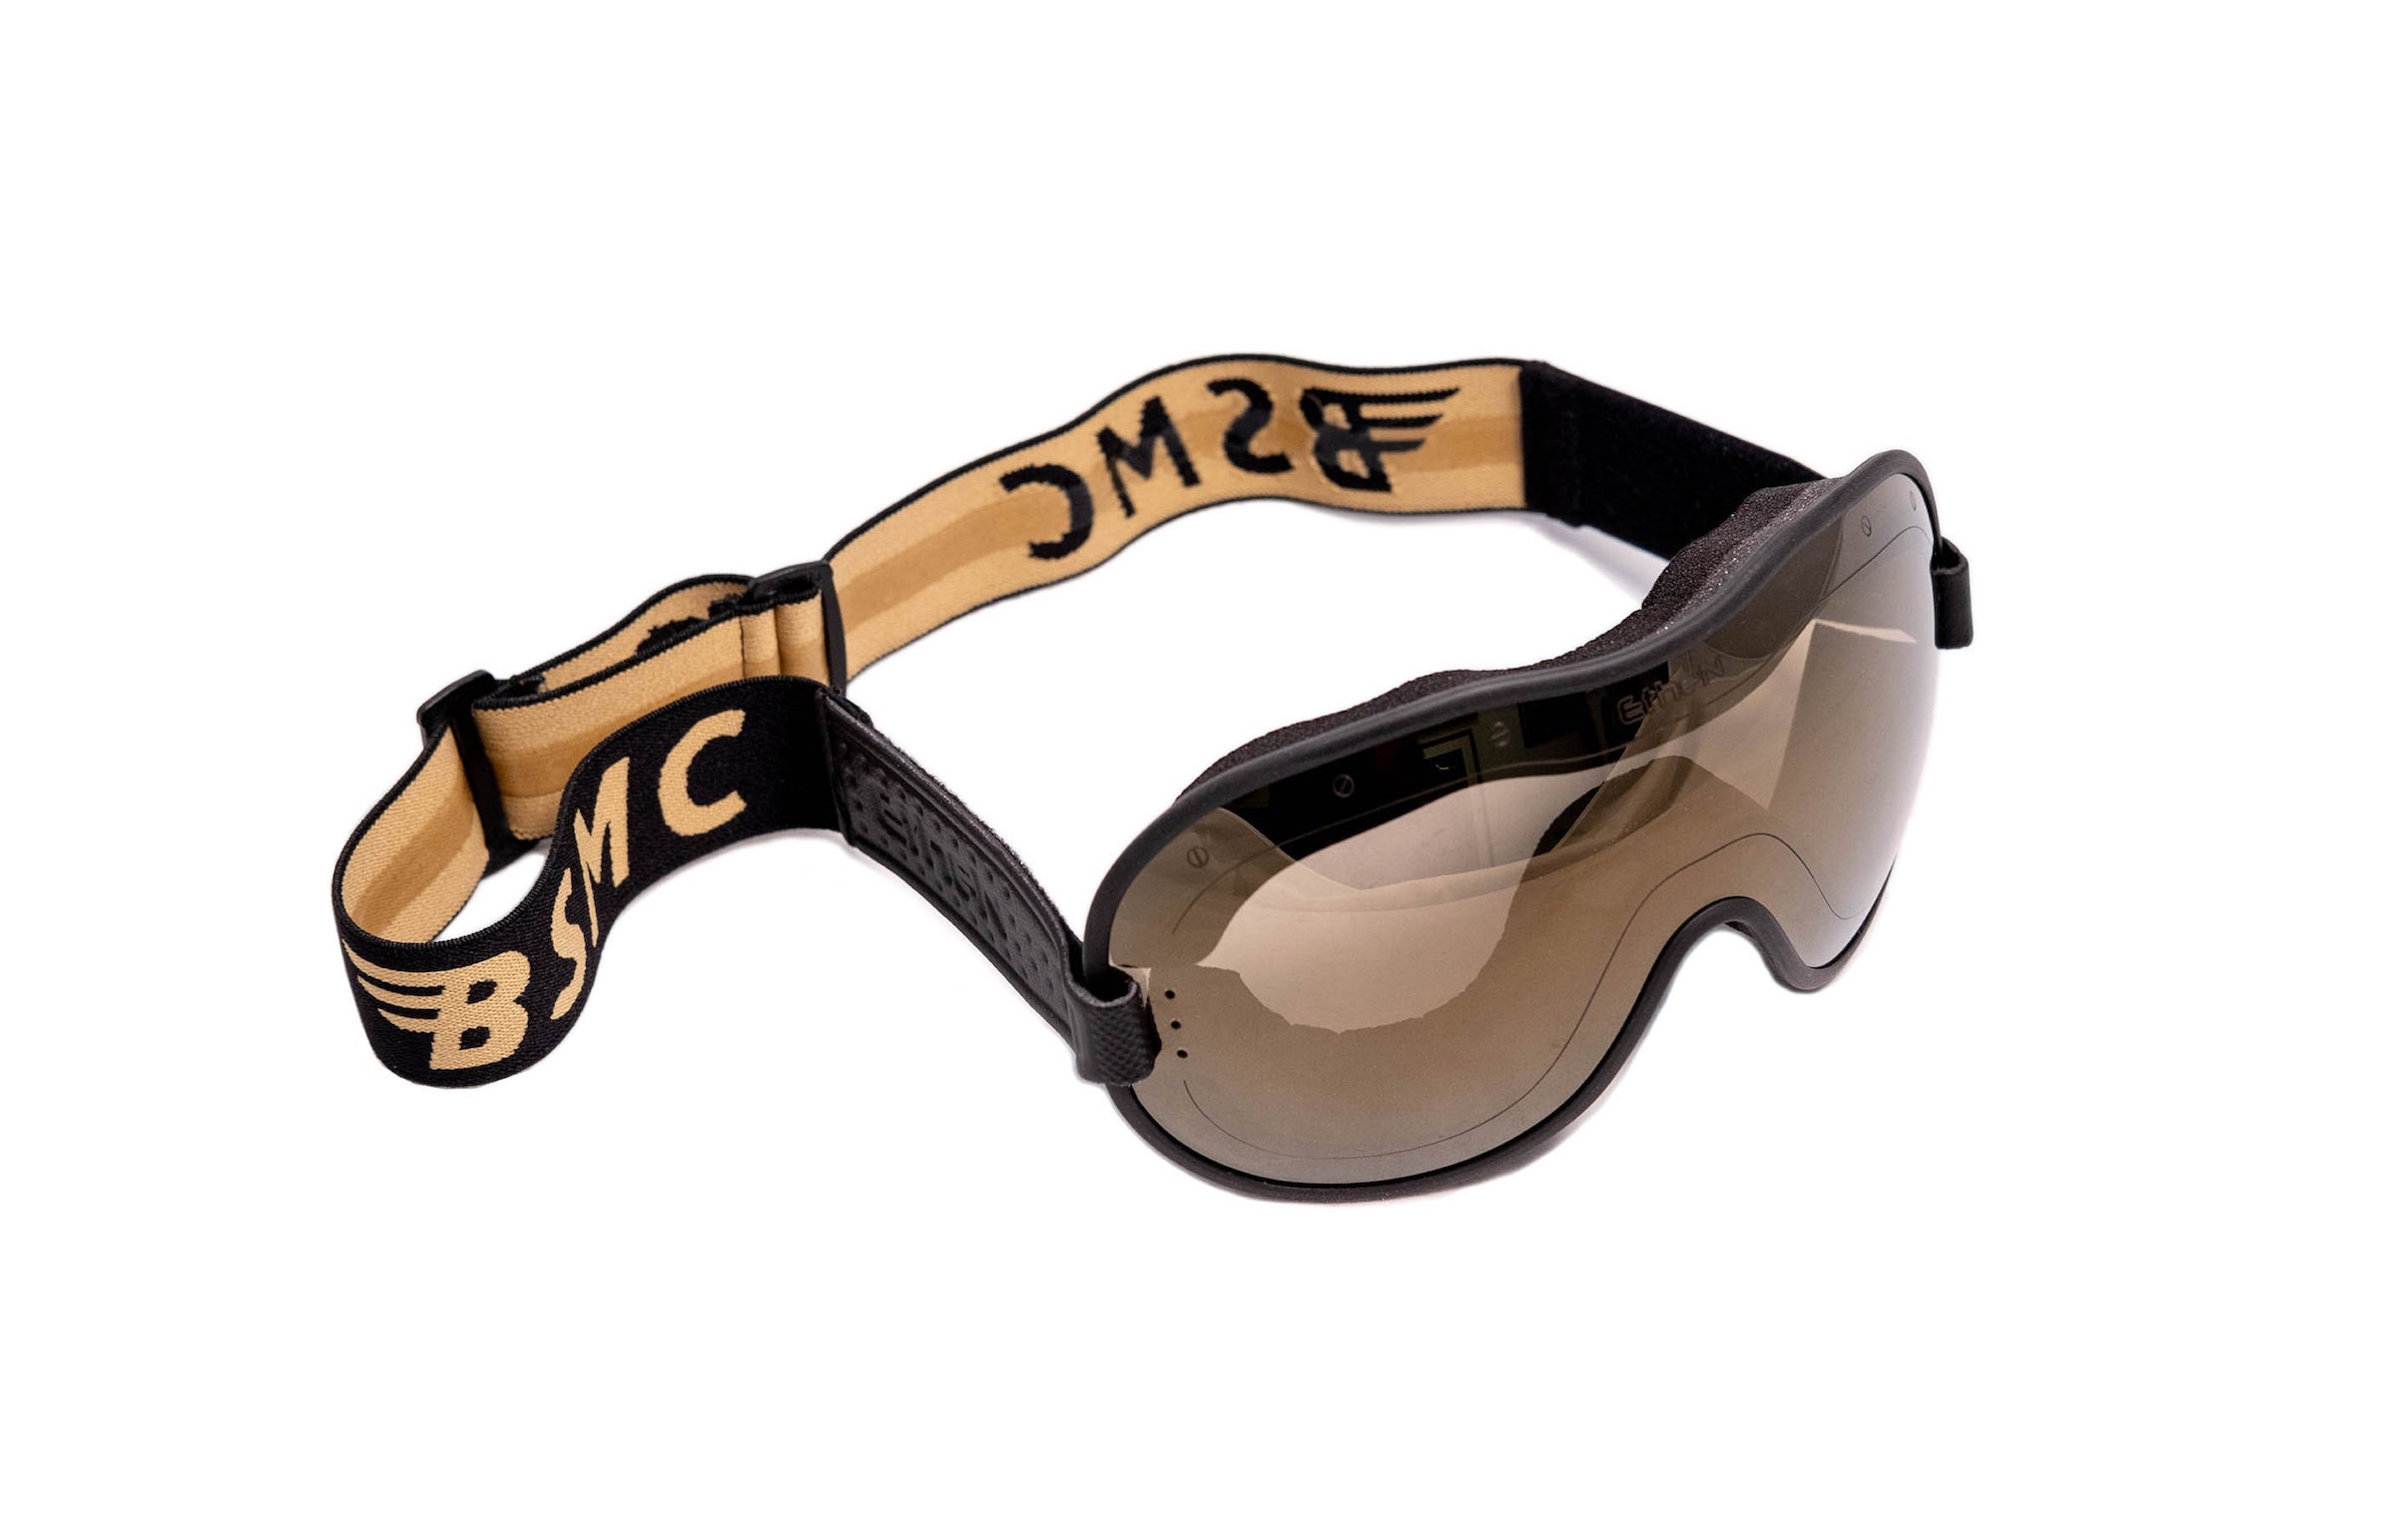 BSMA x Ethen Cafe Racer Goggles